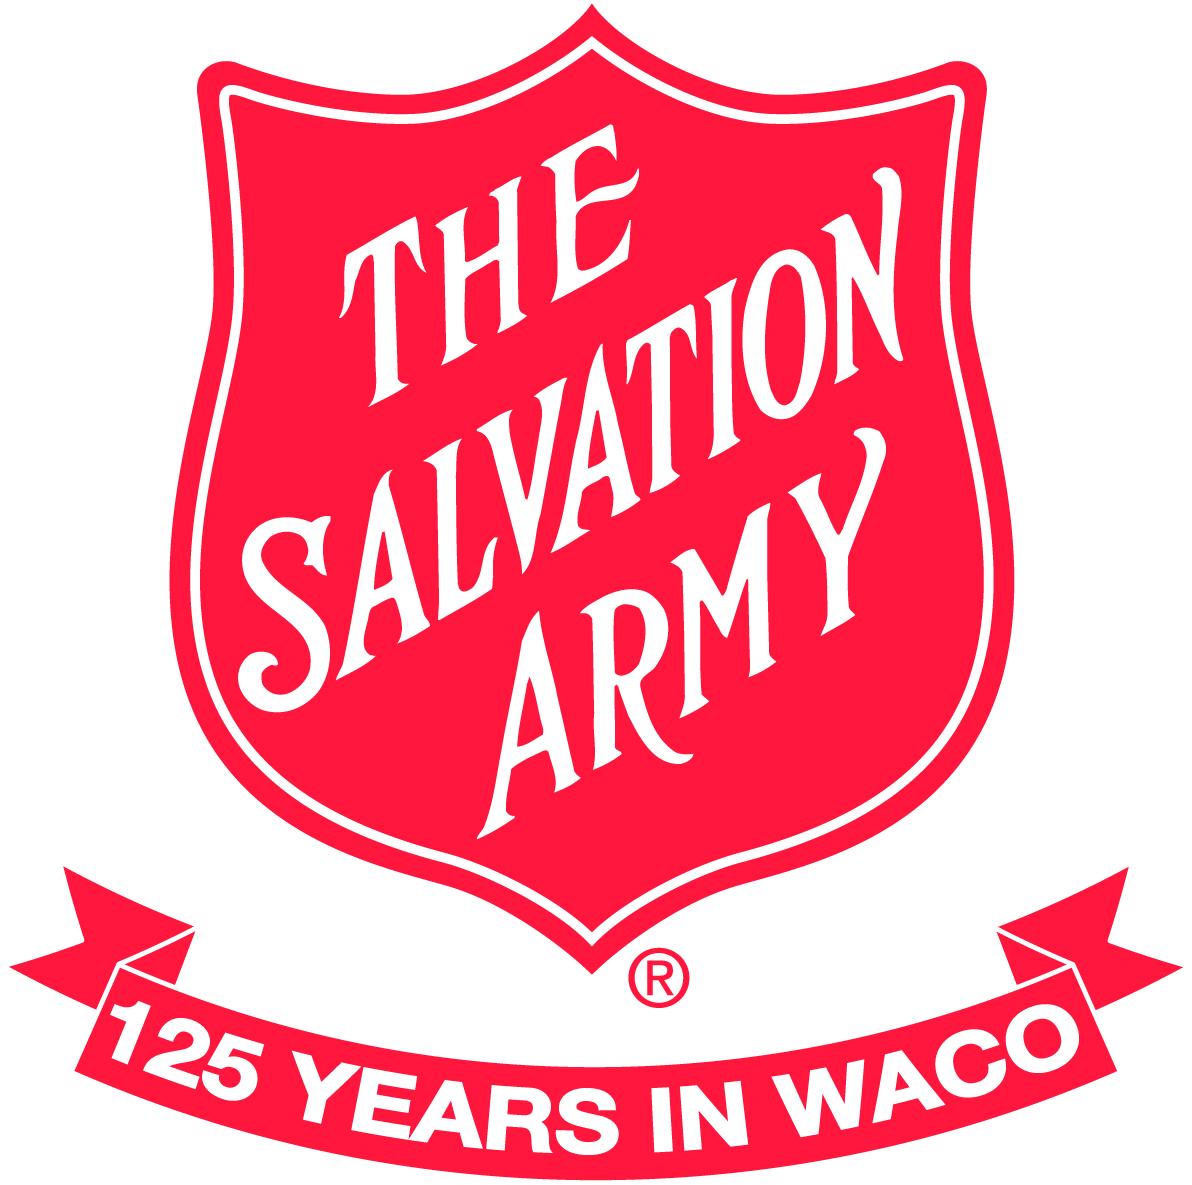 WACO 125 logo.jpg